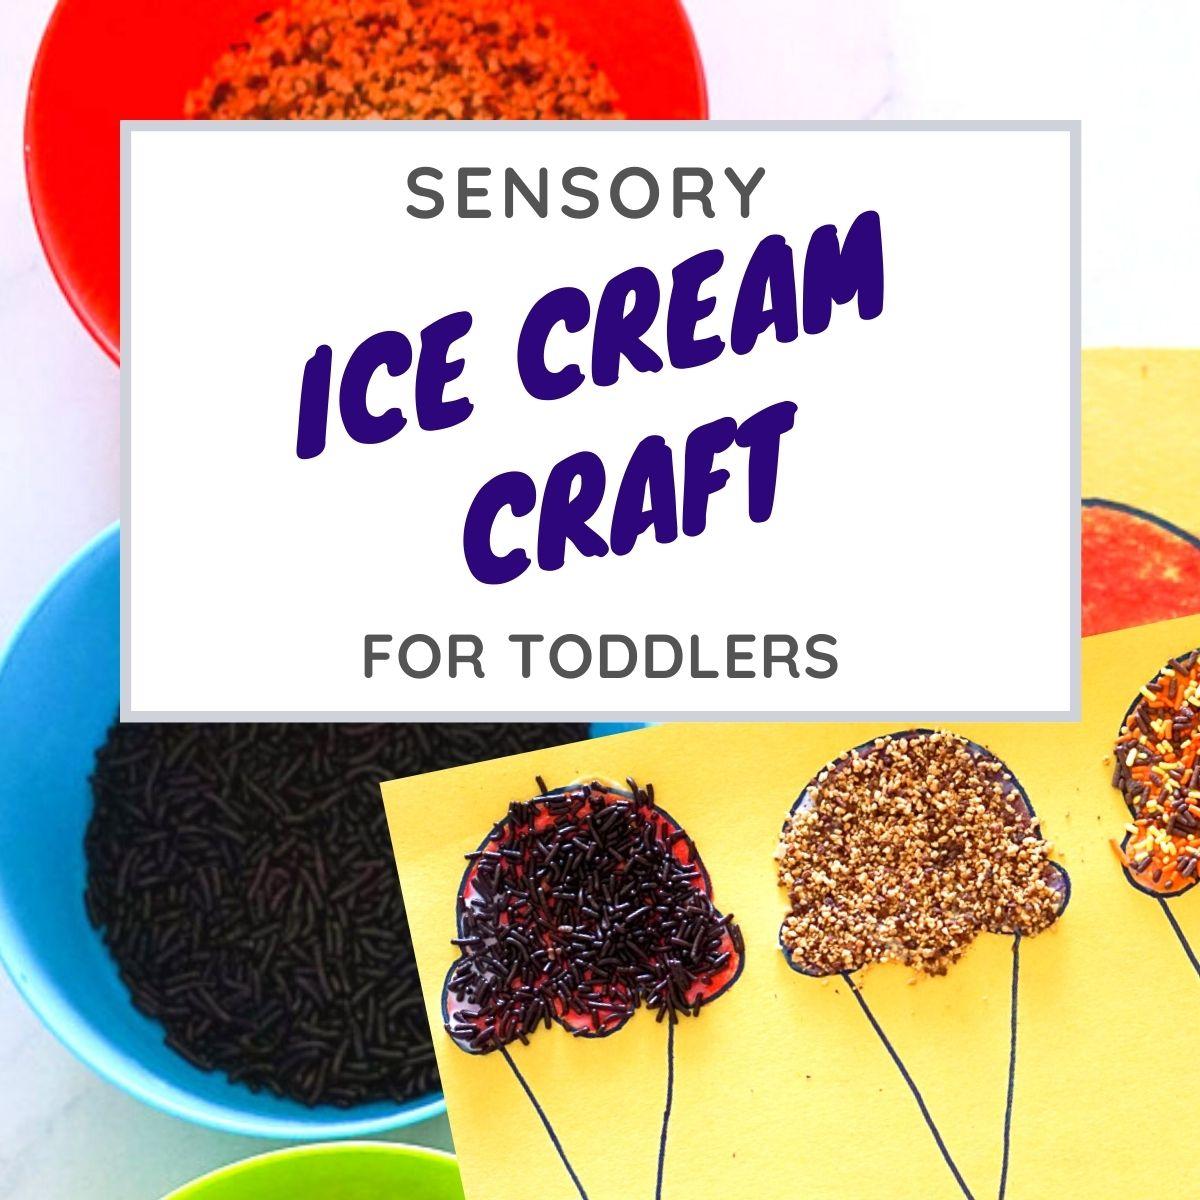 sensory ice cream craft graphic